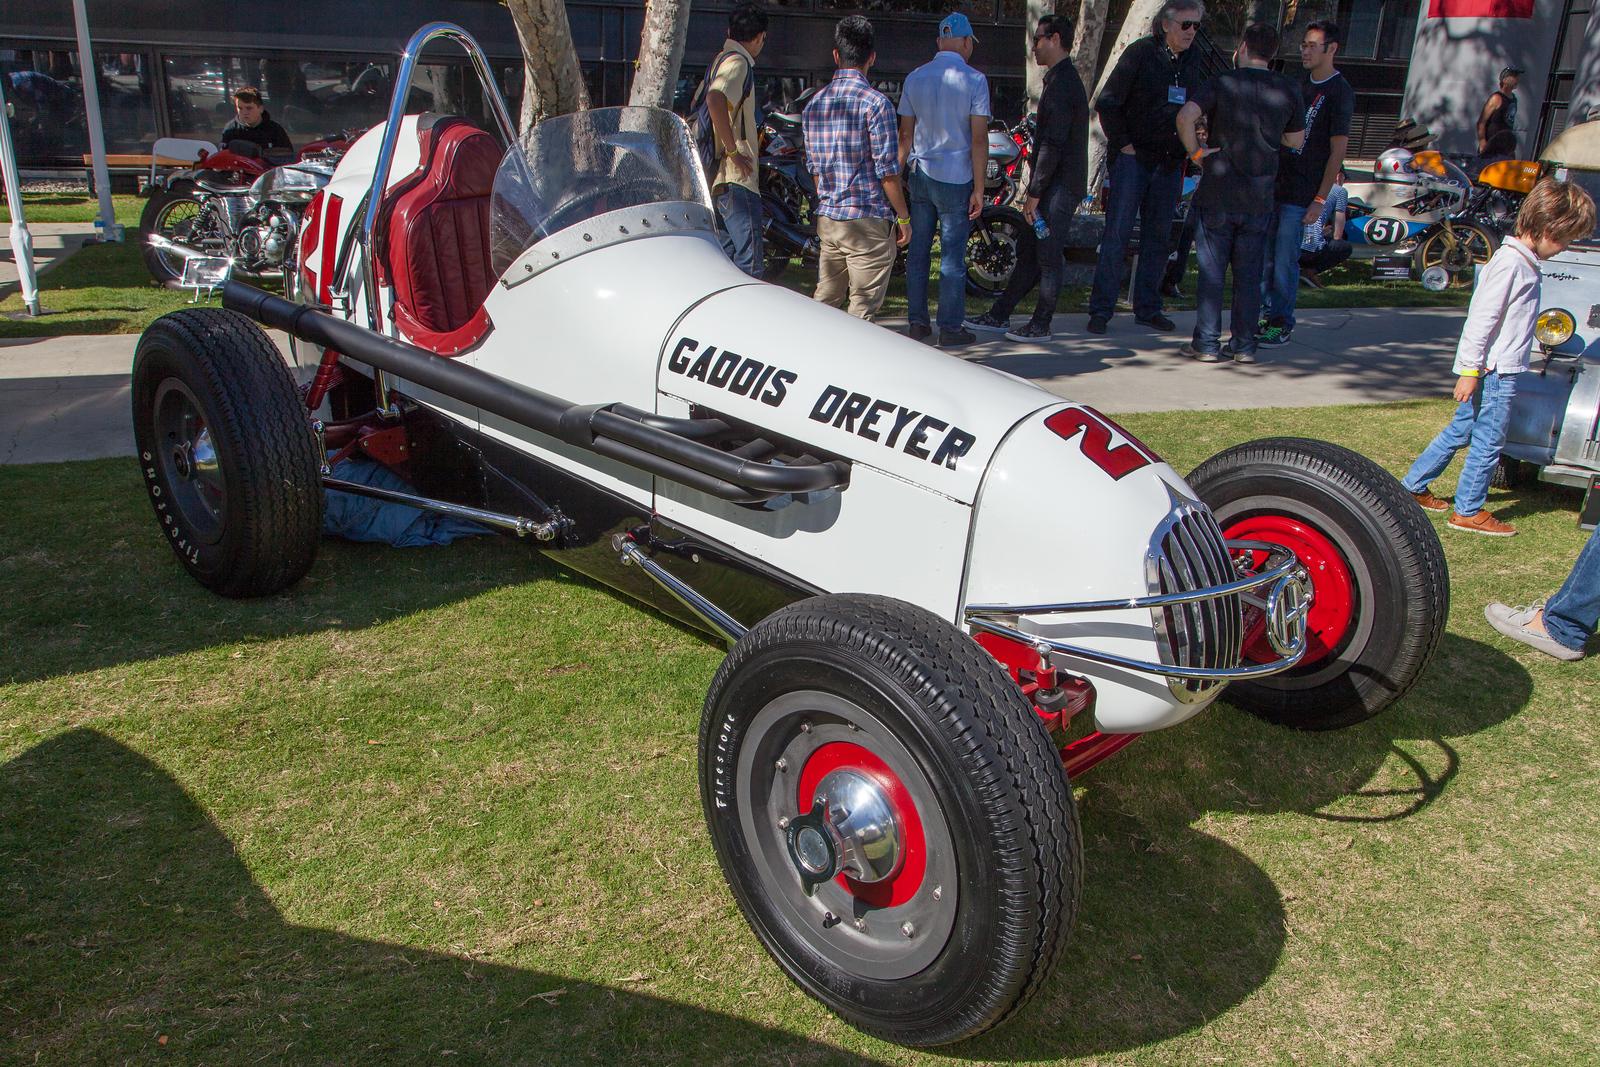 1953 Gaddis Dreyer racer car